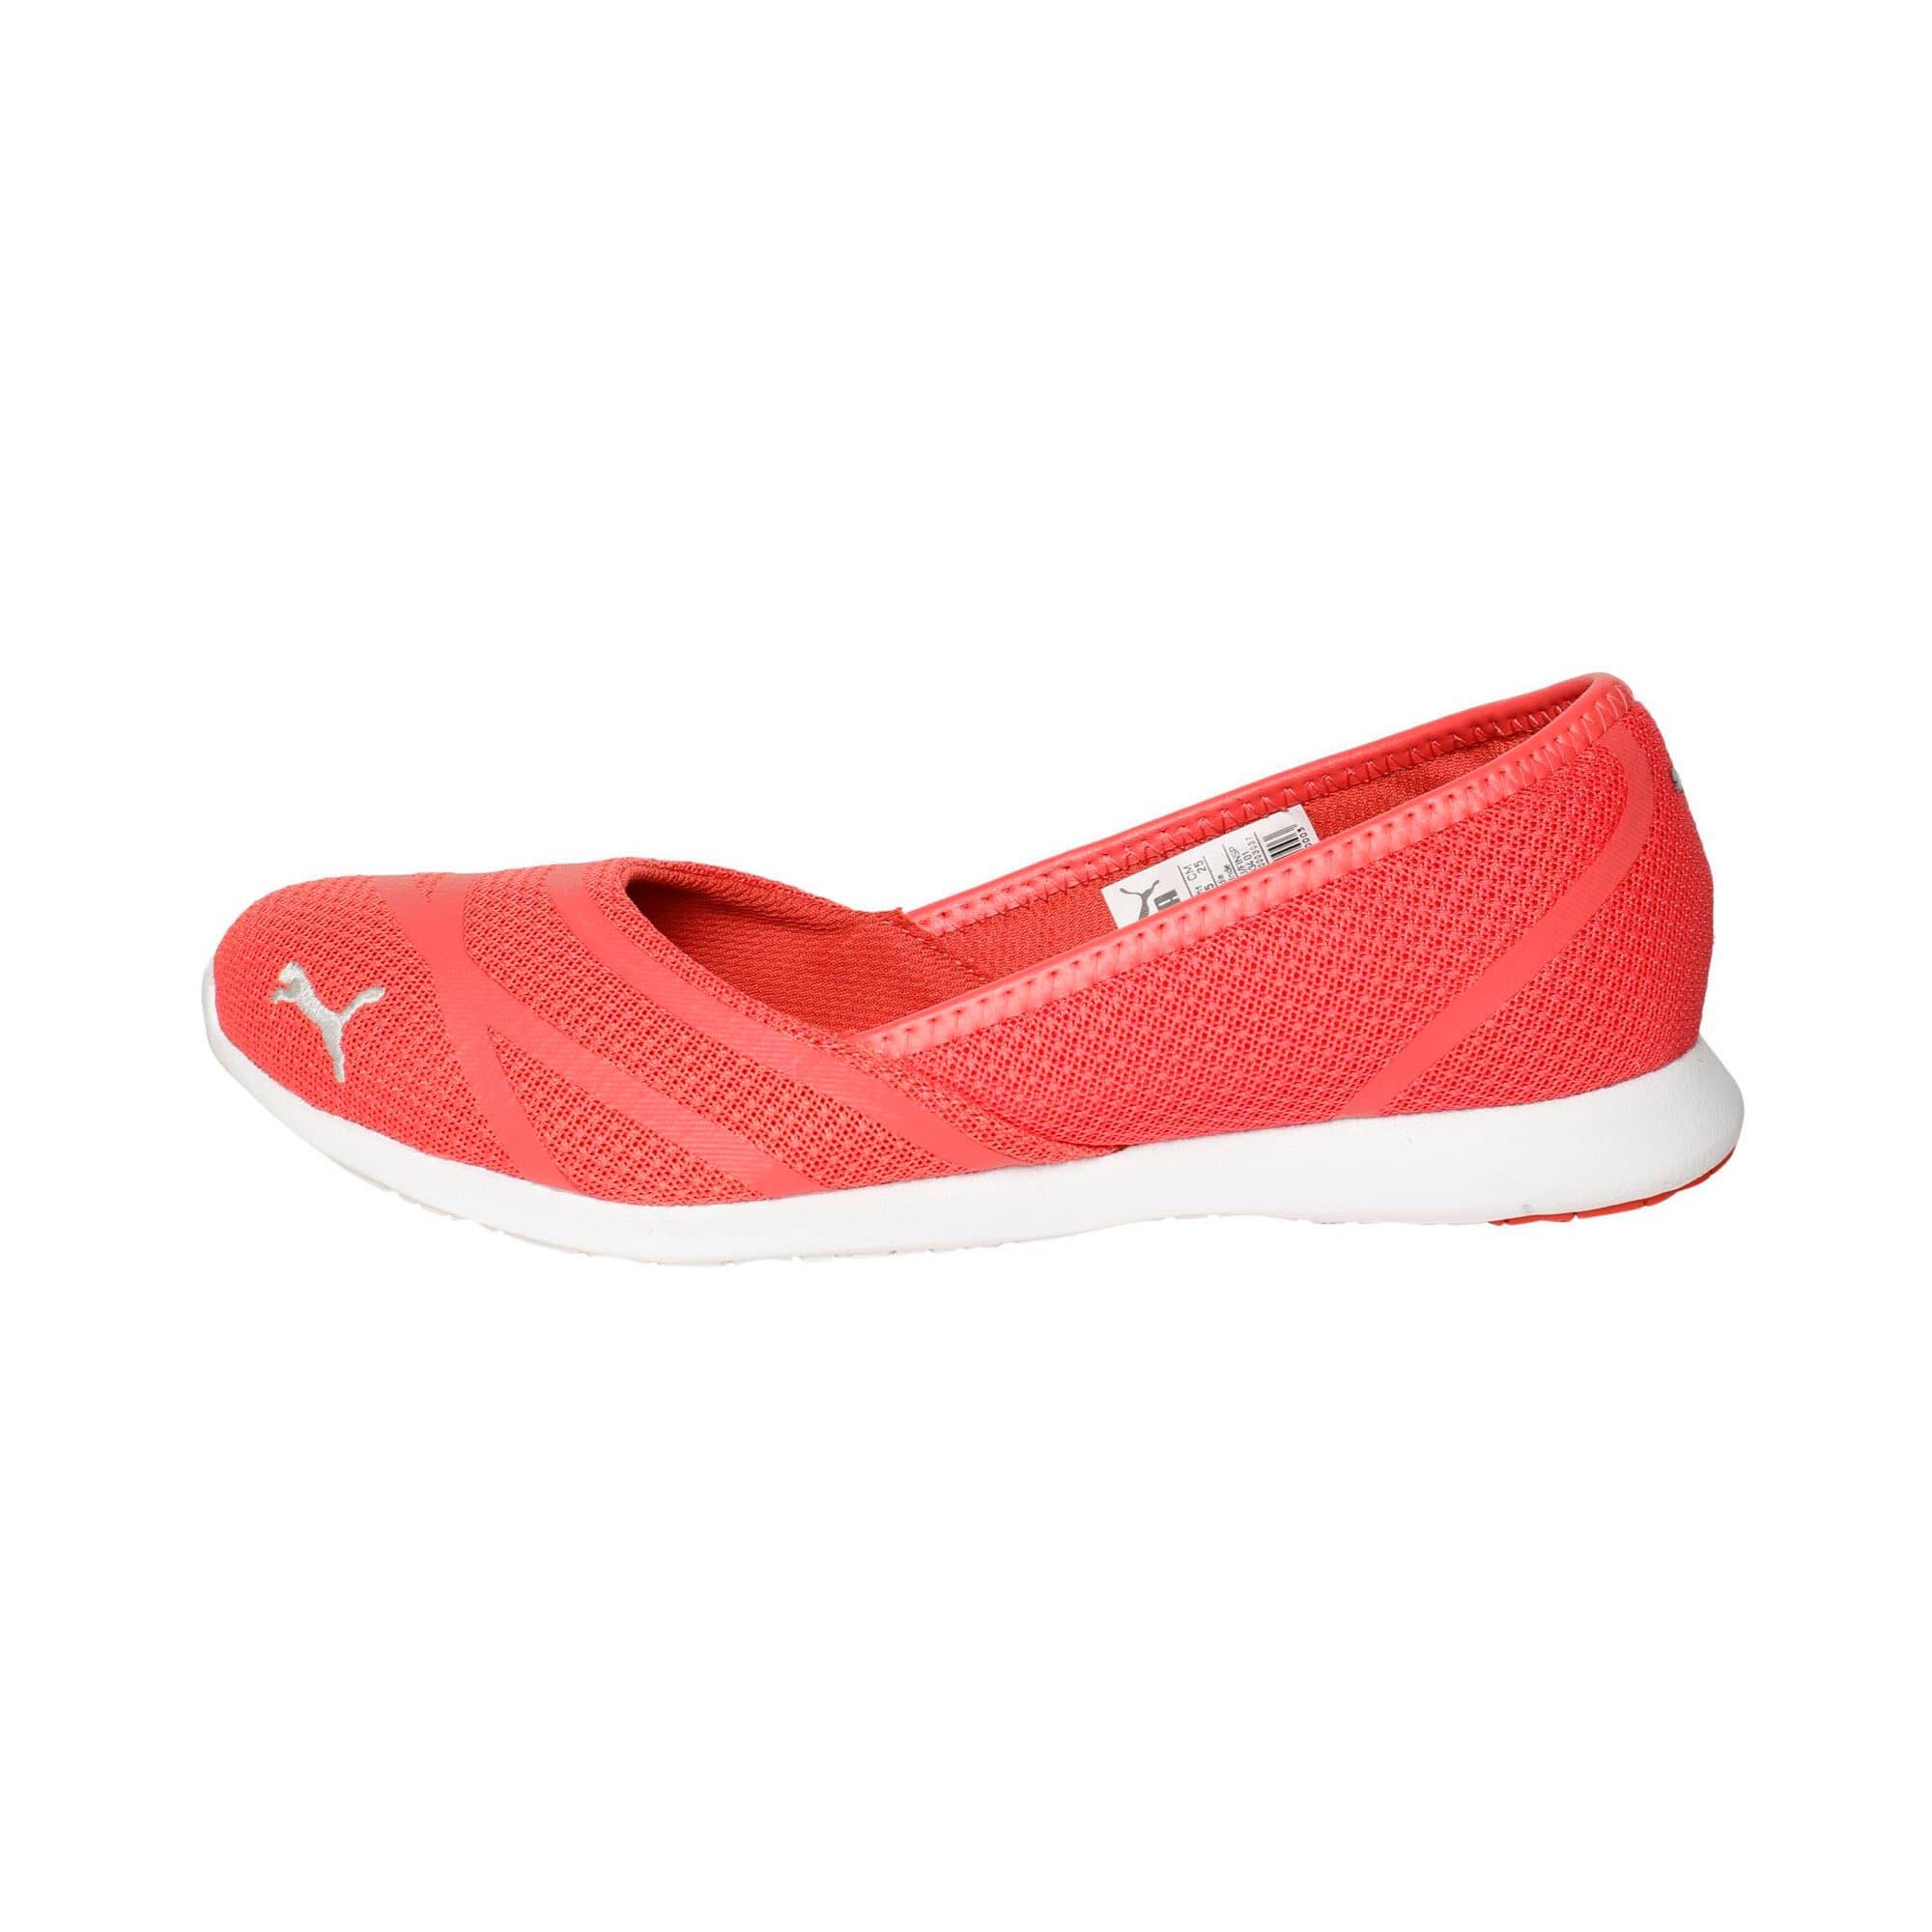 Thumbnail 1 of Escaper SL Jr Running Shoes, Puma Black-Puma White, medium-IND